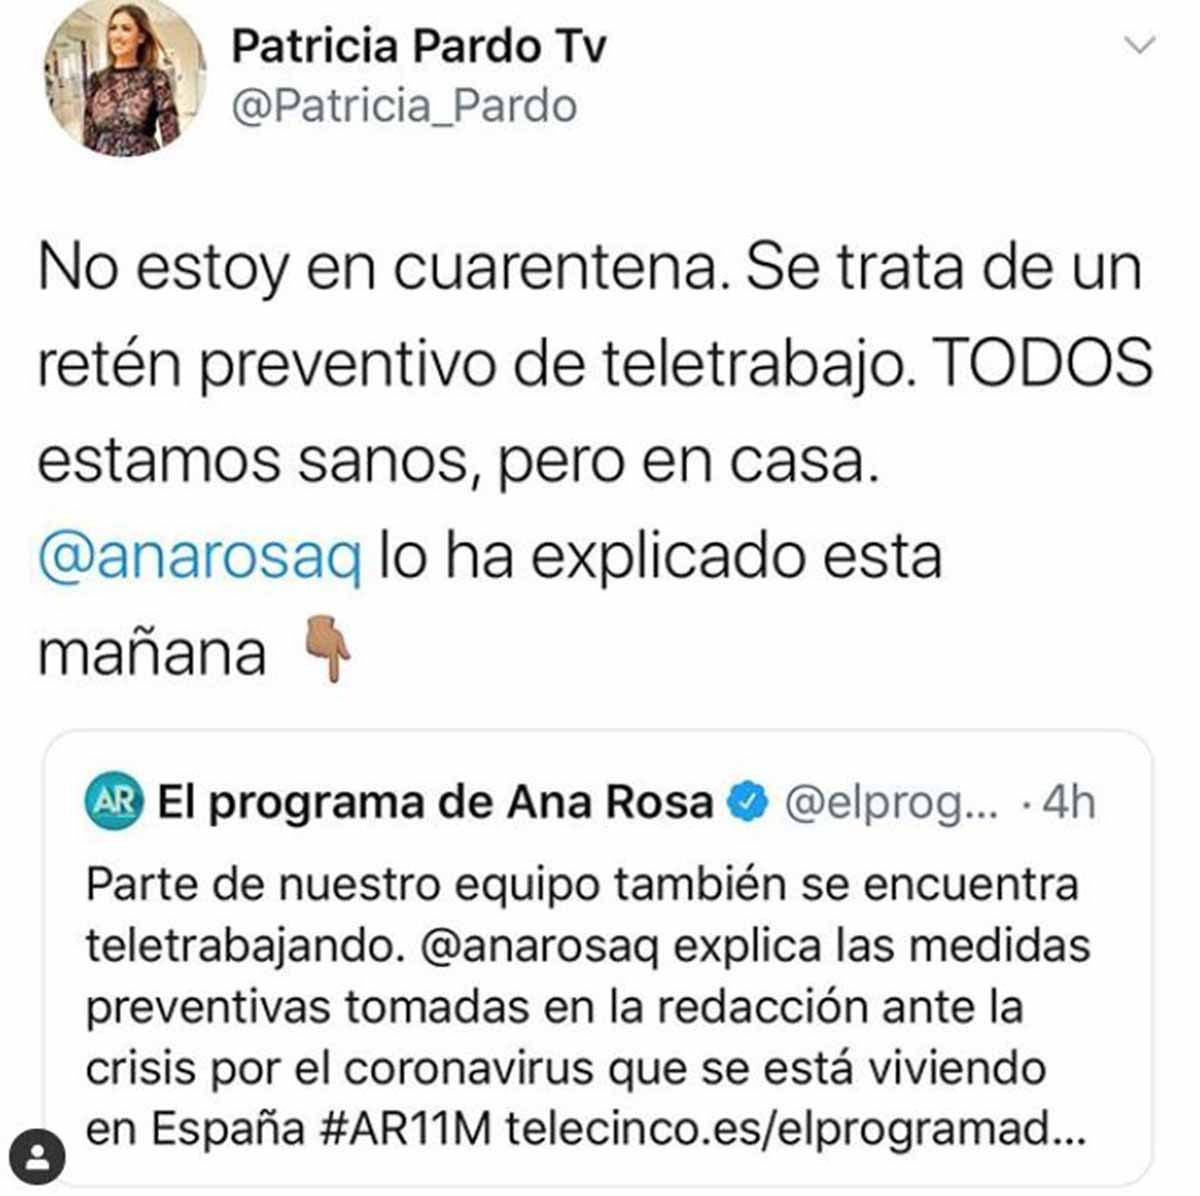 Patricia Pardo